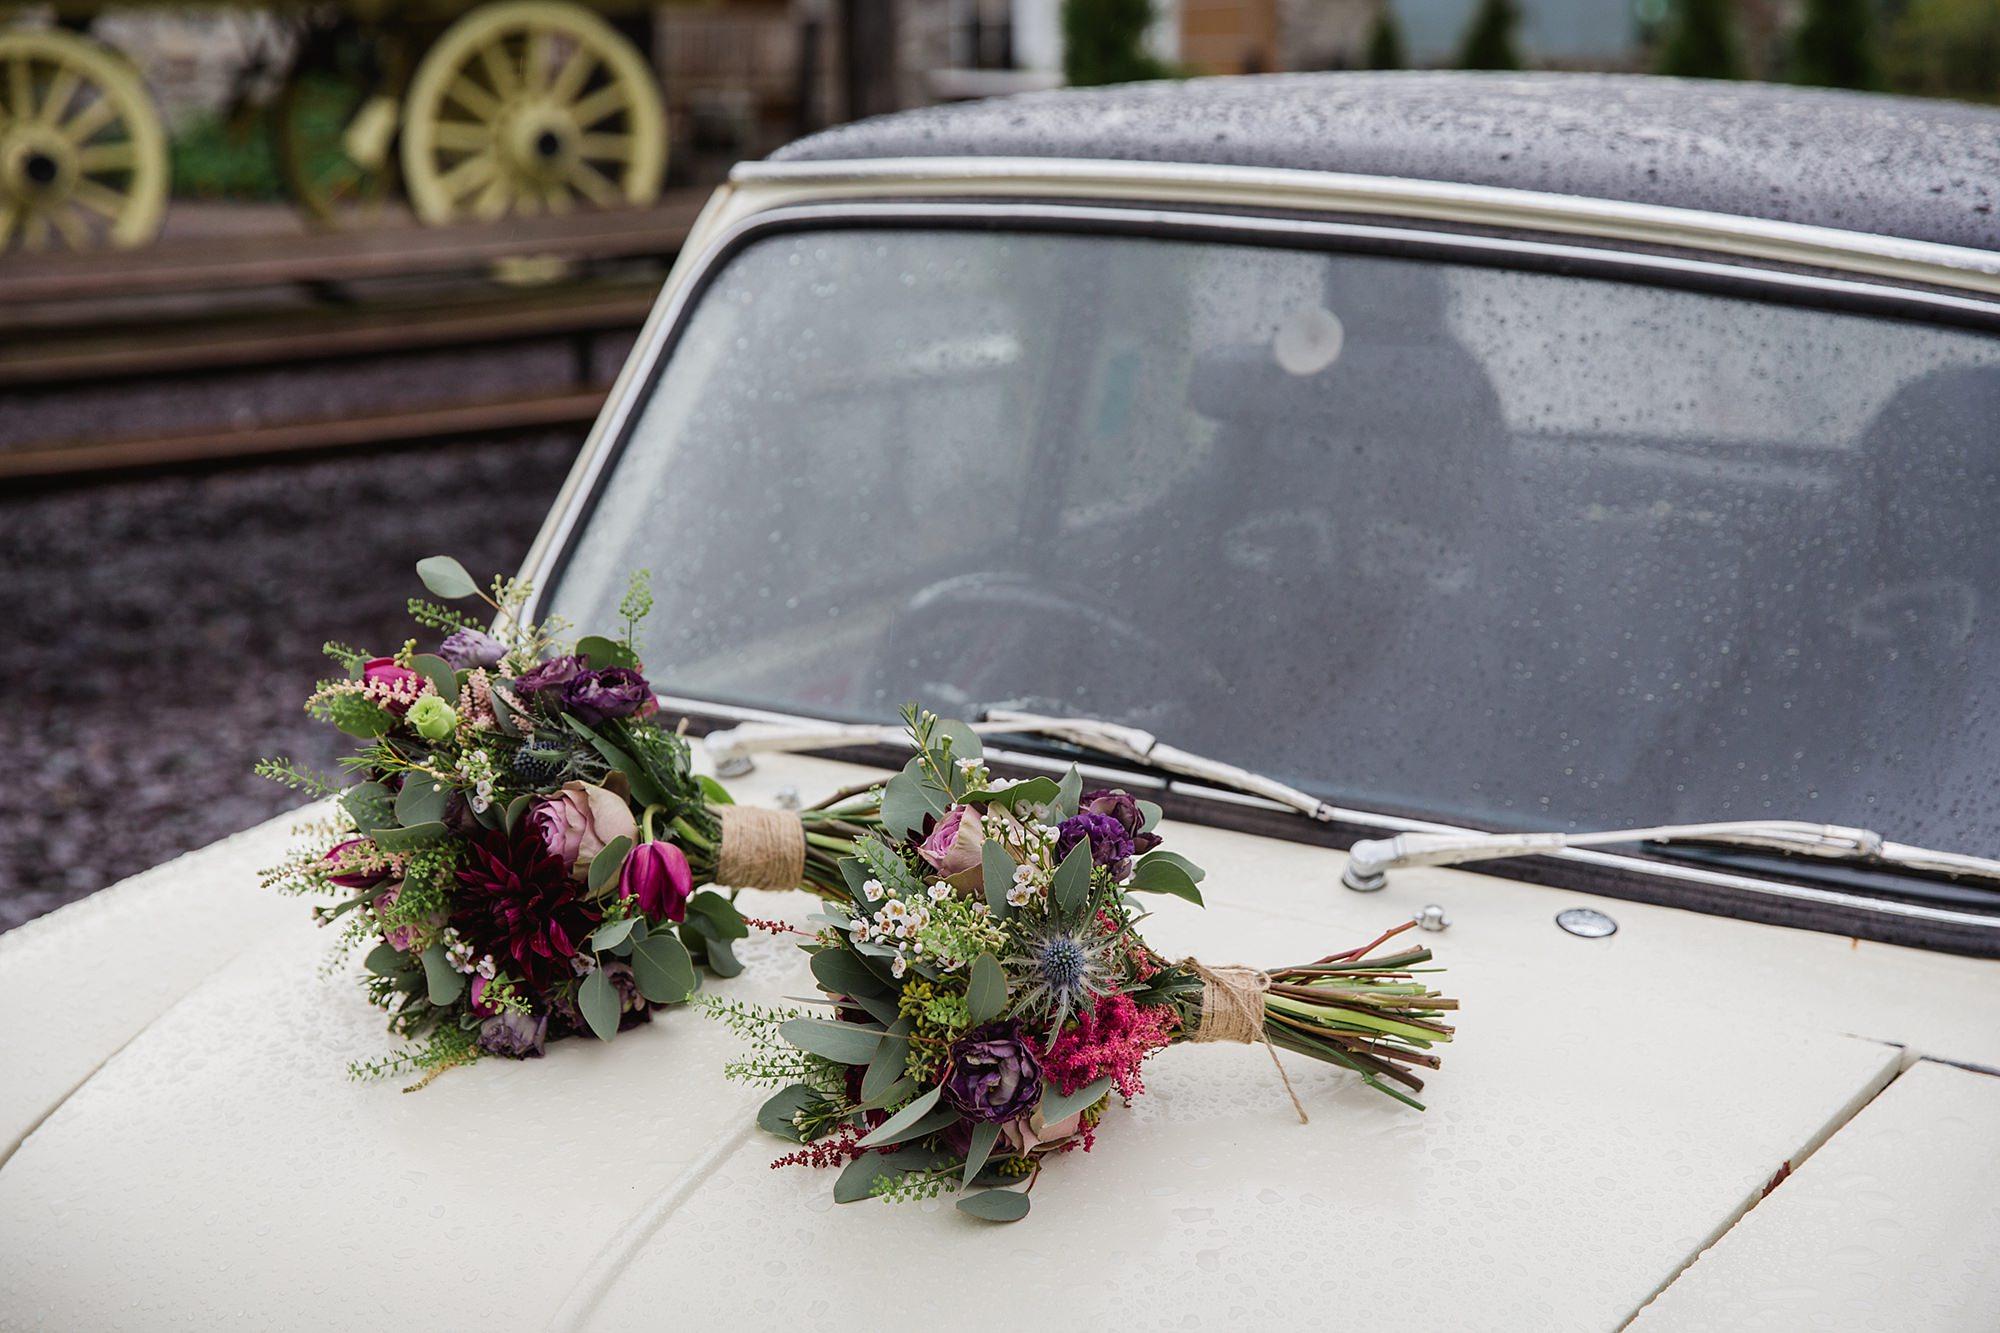 A fun wedding picture of bride's bouquet on mini cooper